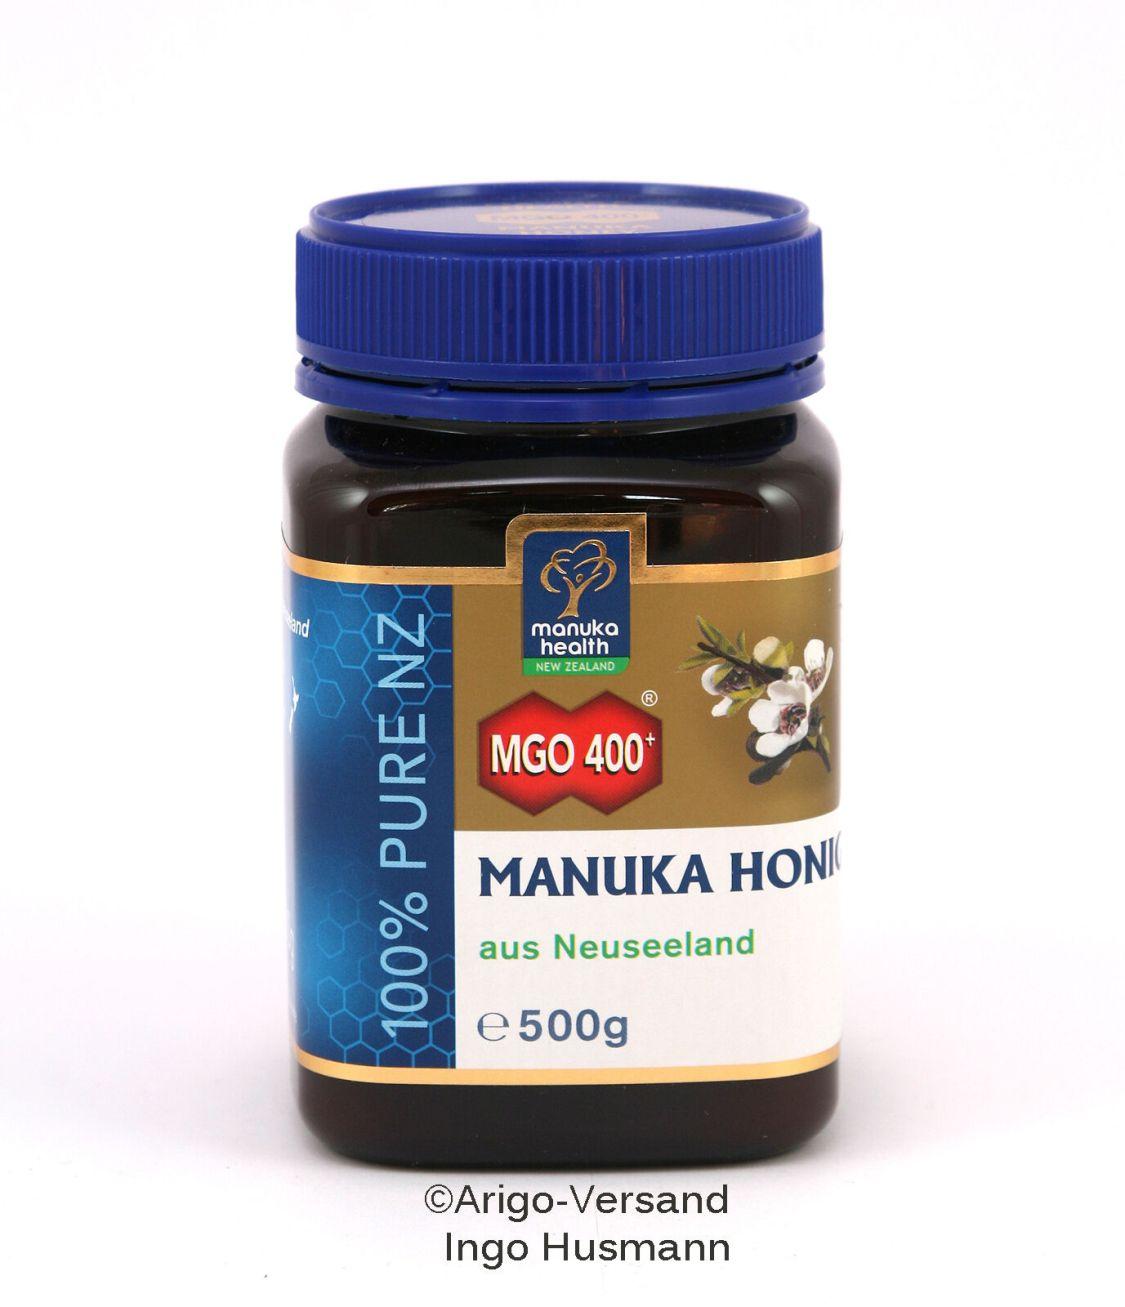 Aktiver Manuka-Honig MGO™ 400+,  250g / 500g / 2x500g aus Neuseeland